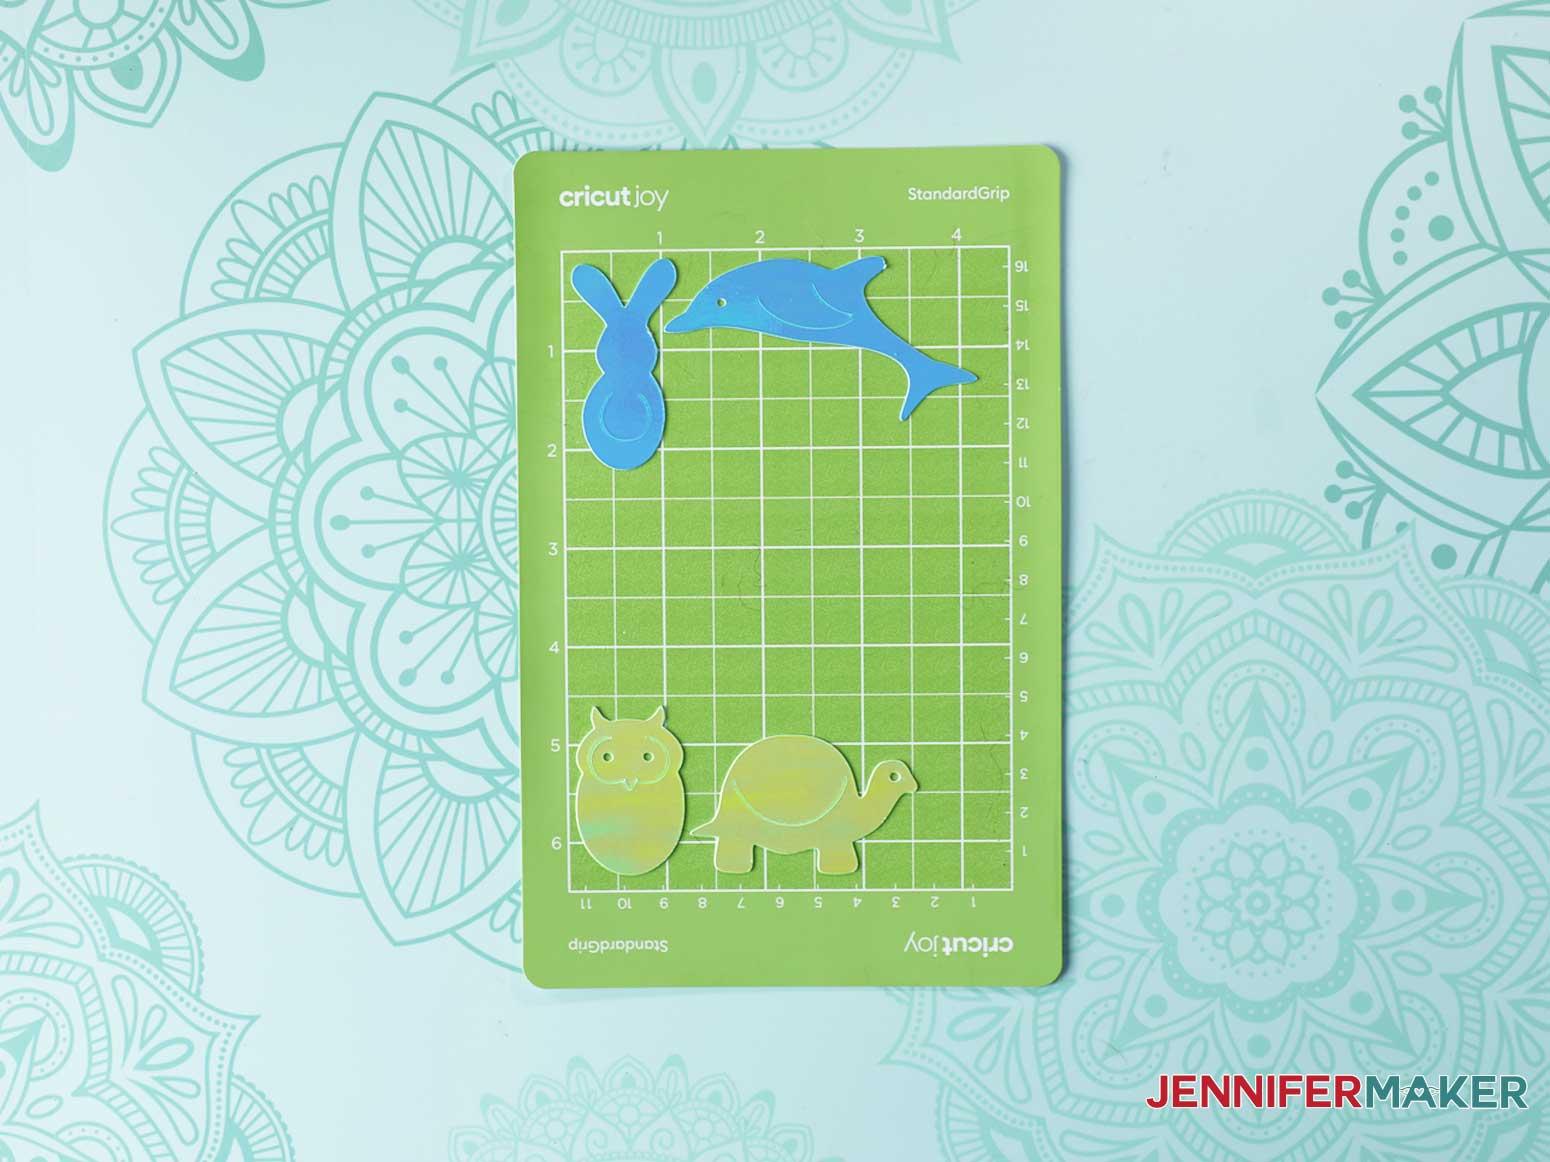 Animal Paperclips on Cricut Joy mat